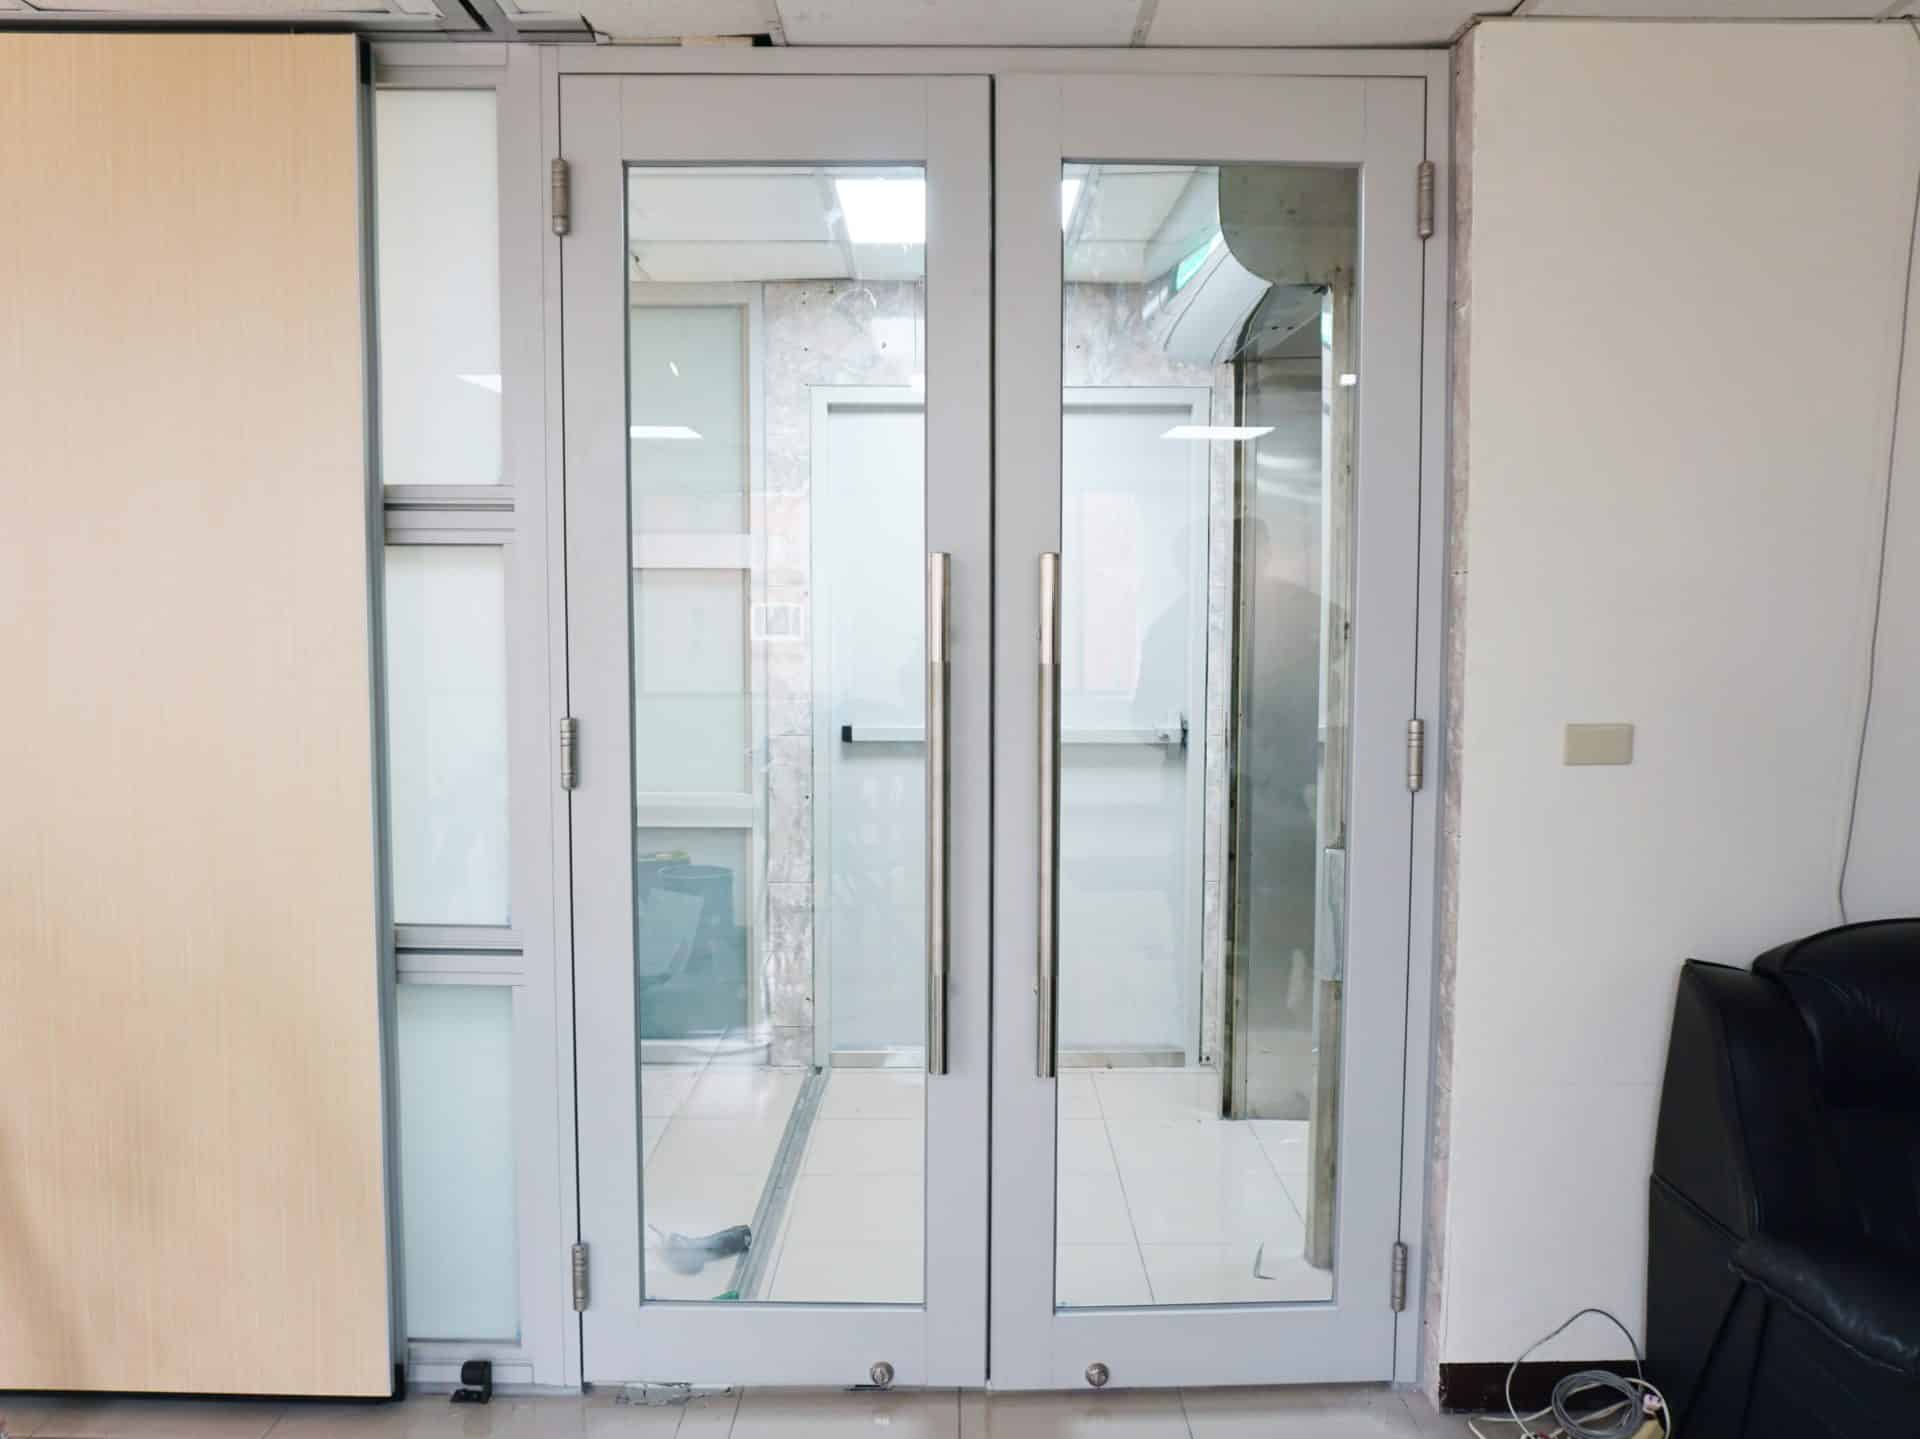 Aluminum door hinges